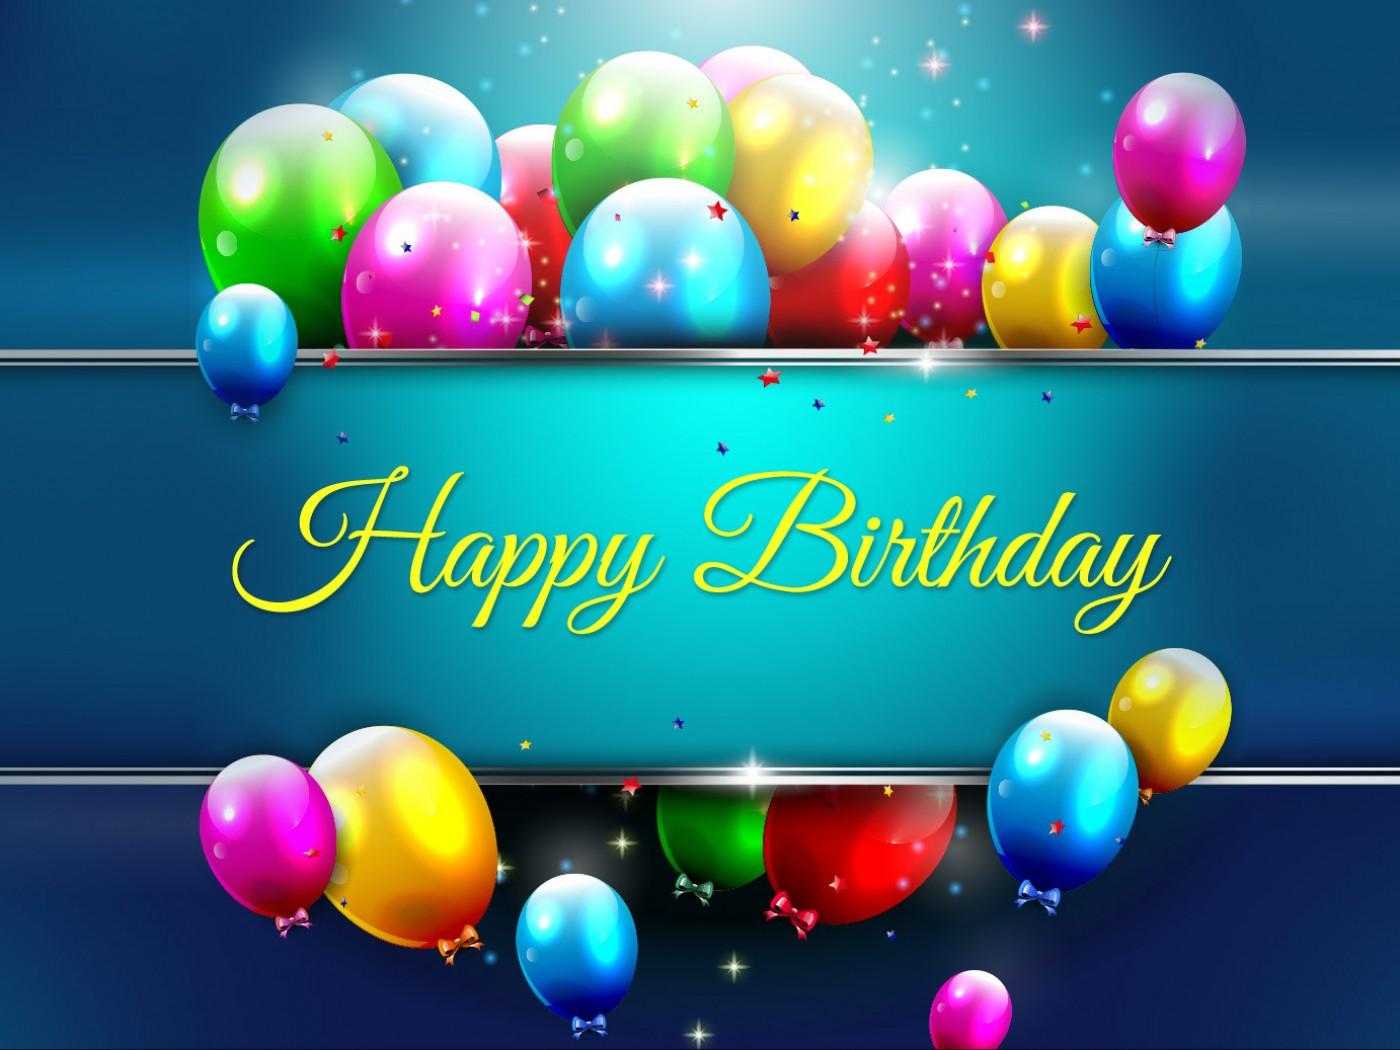 Best ideas about Birthday Wallpaper Hd on Pinterest Birthday 1400x1050